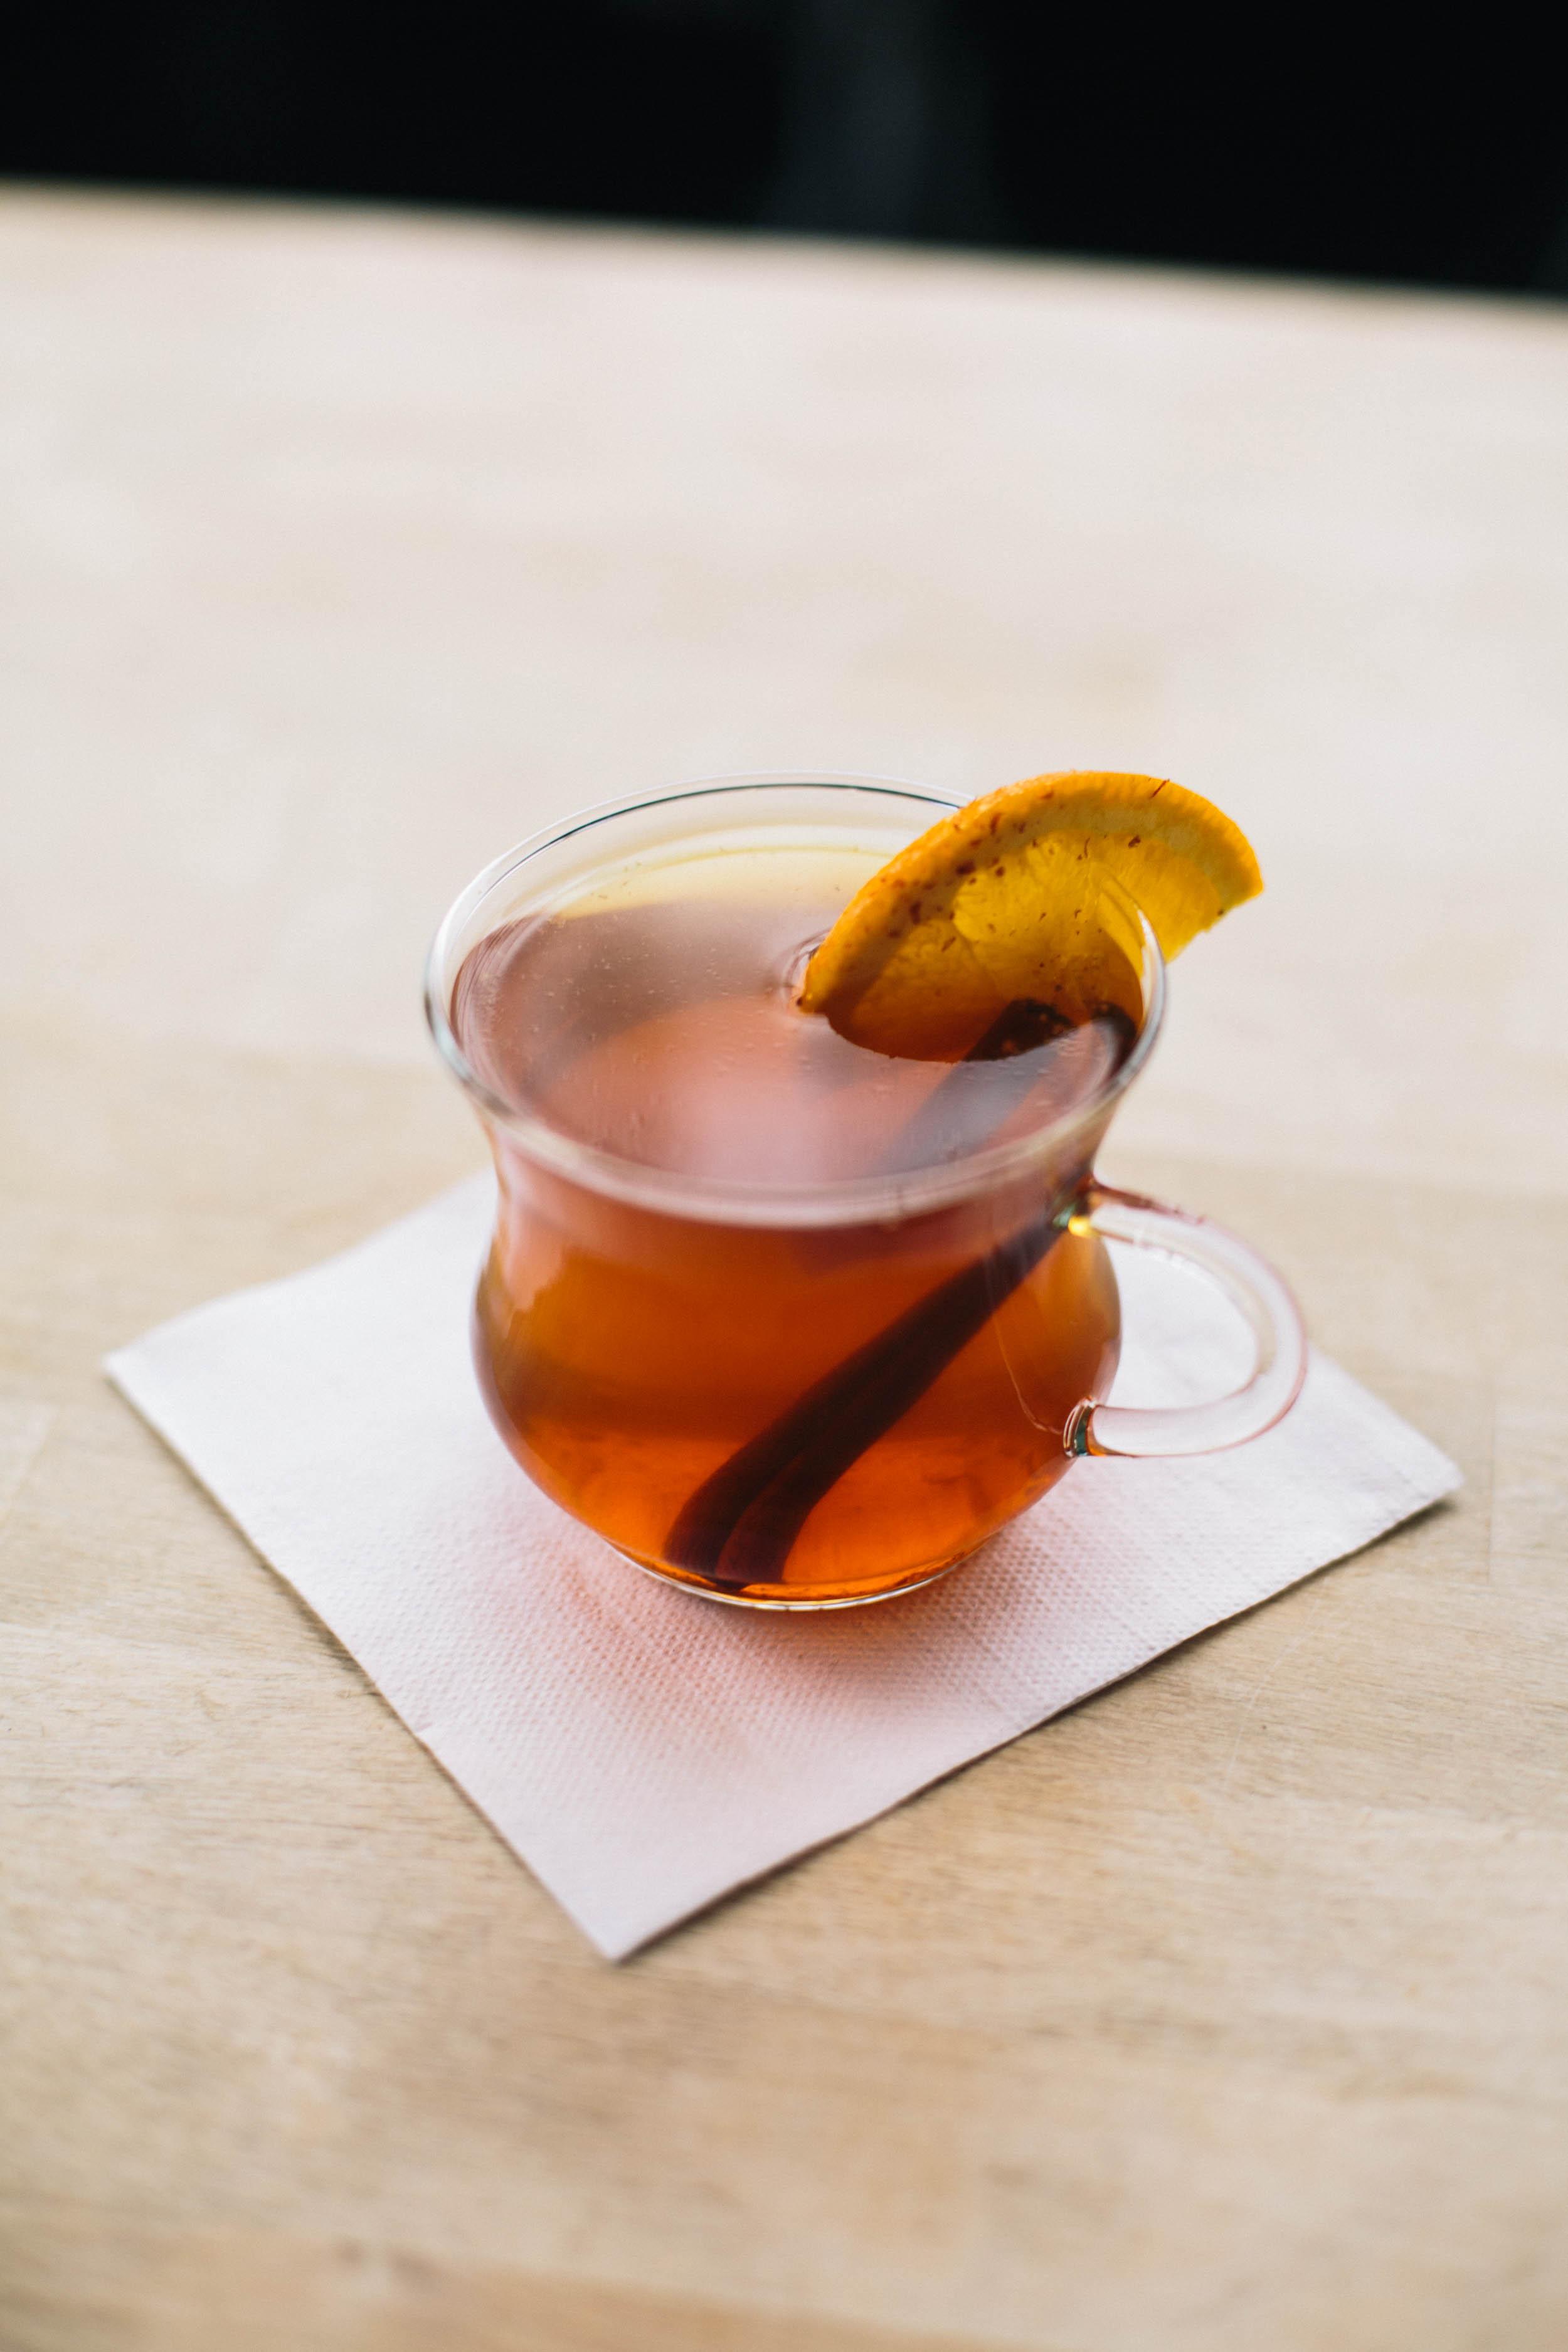 jimmy-rowalt-atlanta-cocktail-food-drink-photography-0100.jpg